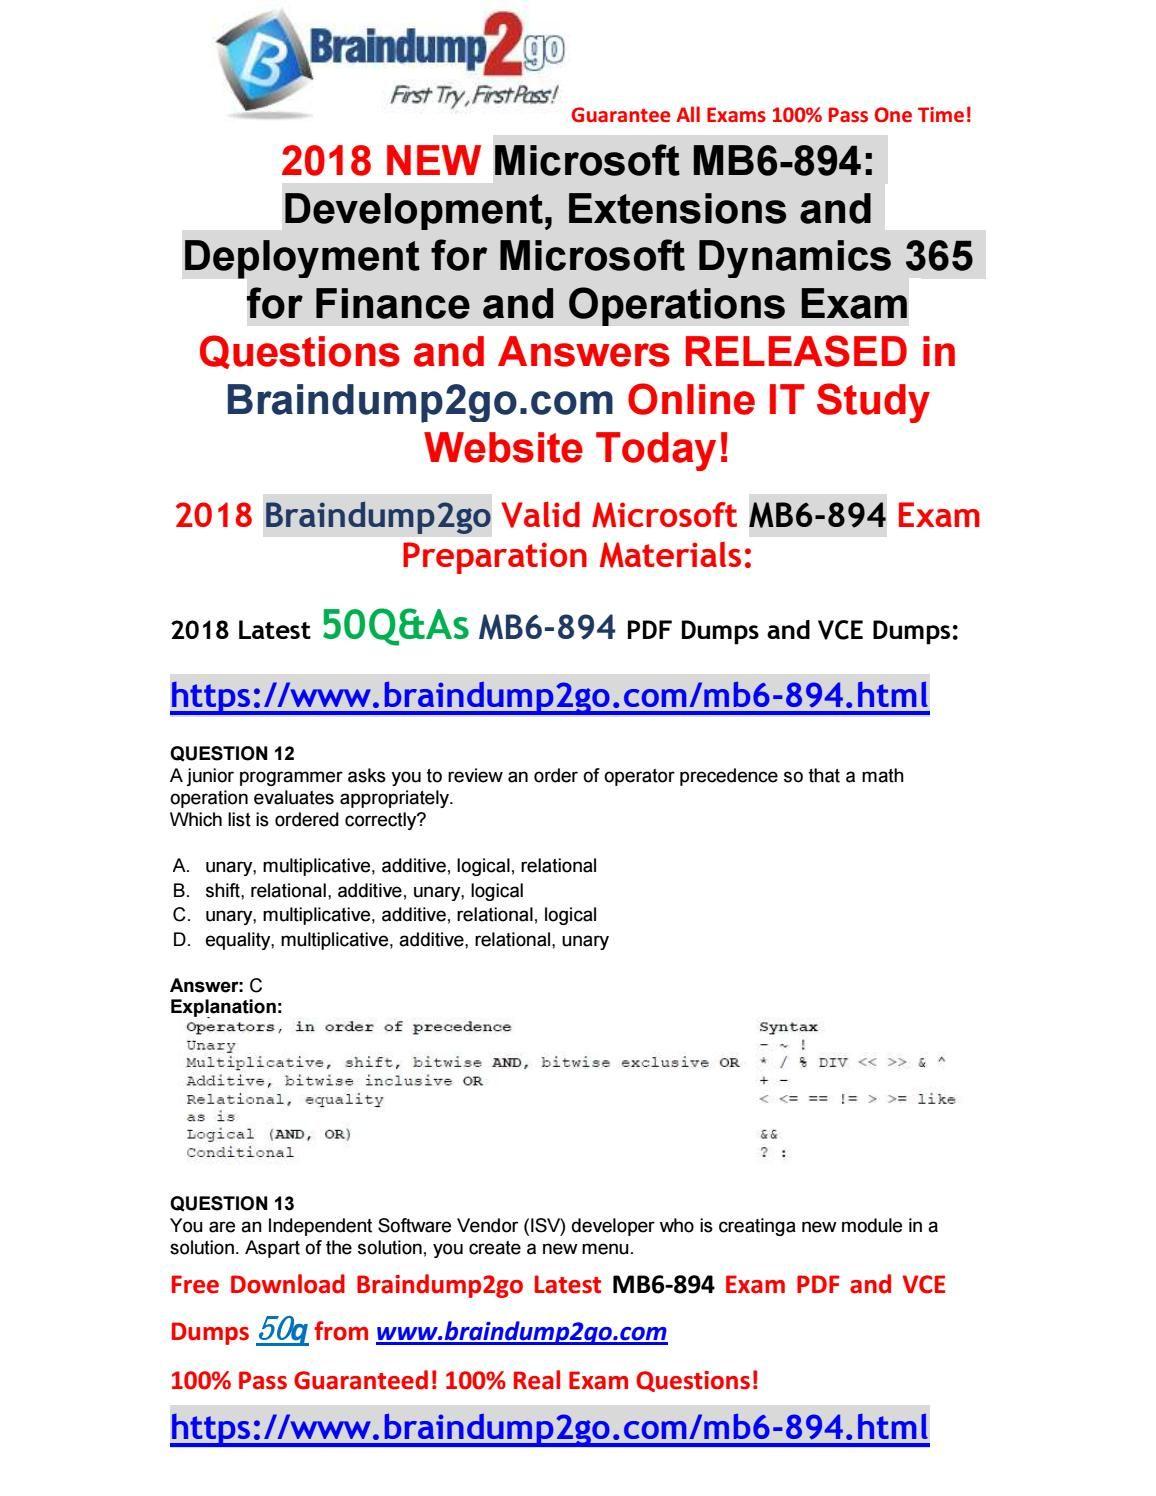 2018 New Microsoft Exam Mb6 894 Vce Dumps 50qas Free Share 12 22